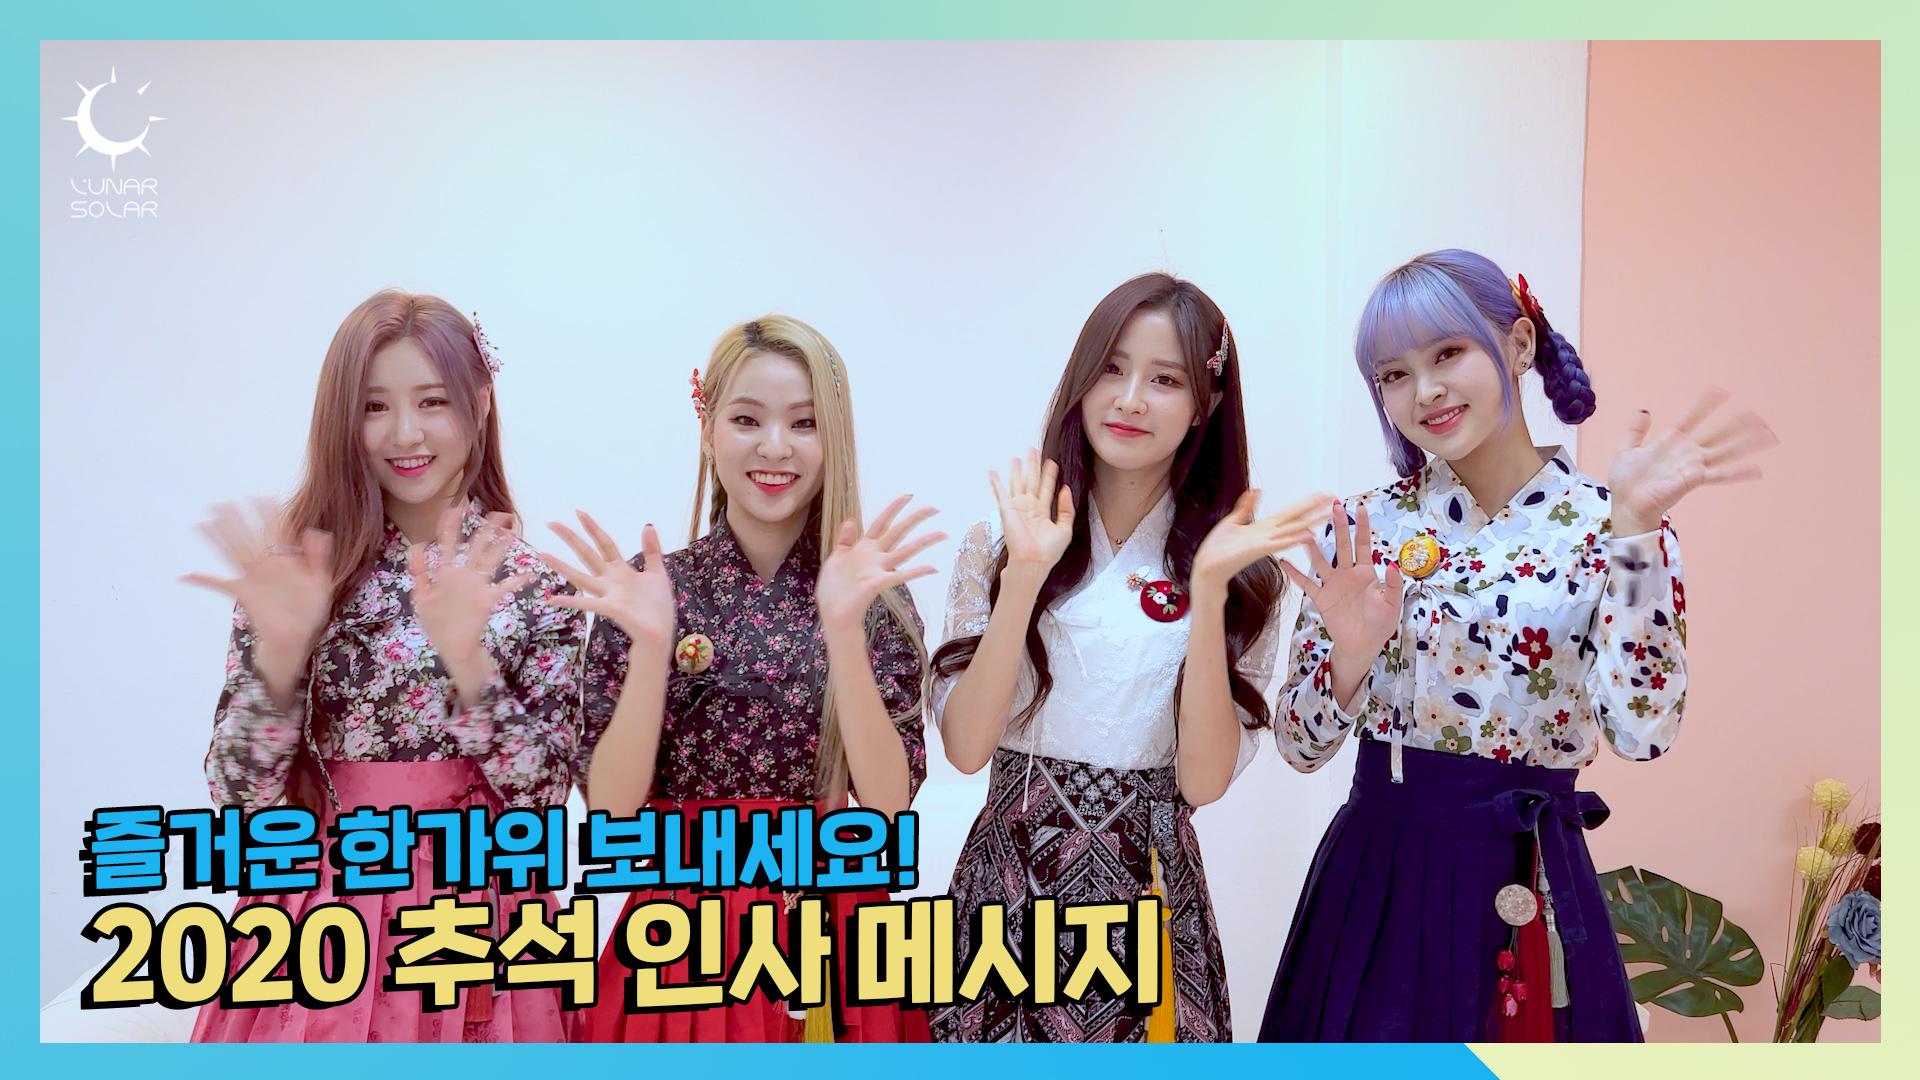 LUNARSOLAR(루나솔라) 2020 추석 인사 메시지 (2020 Korean Thanksgiving Day)